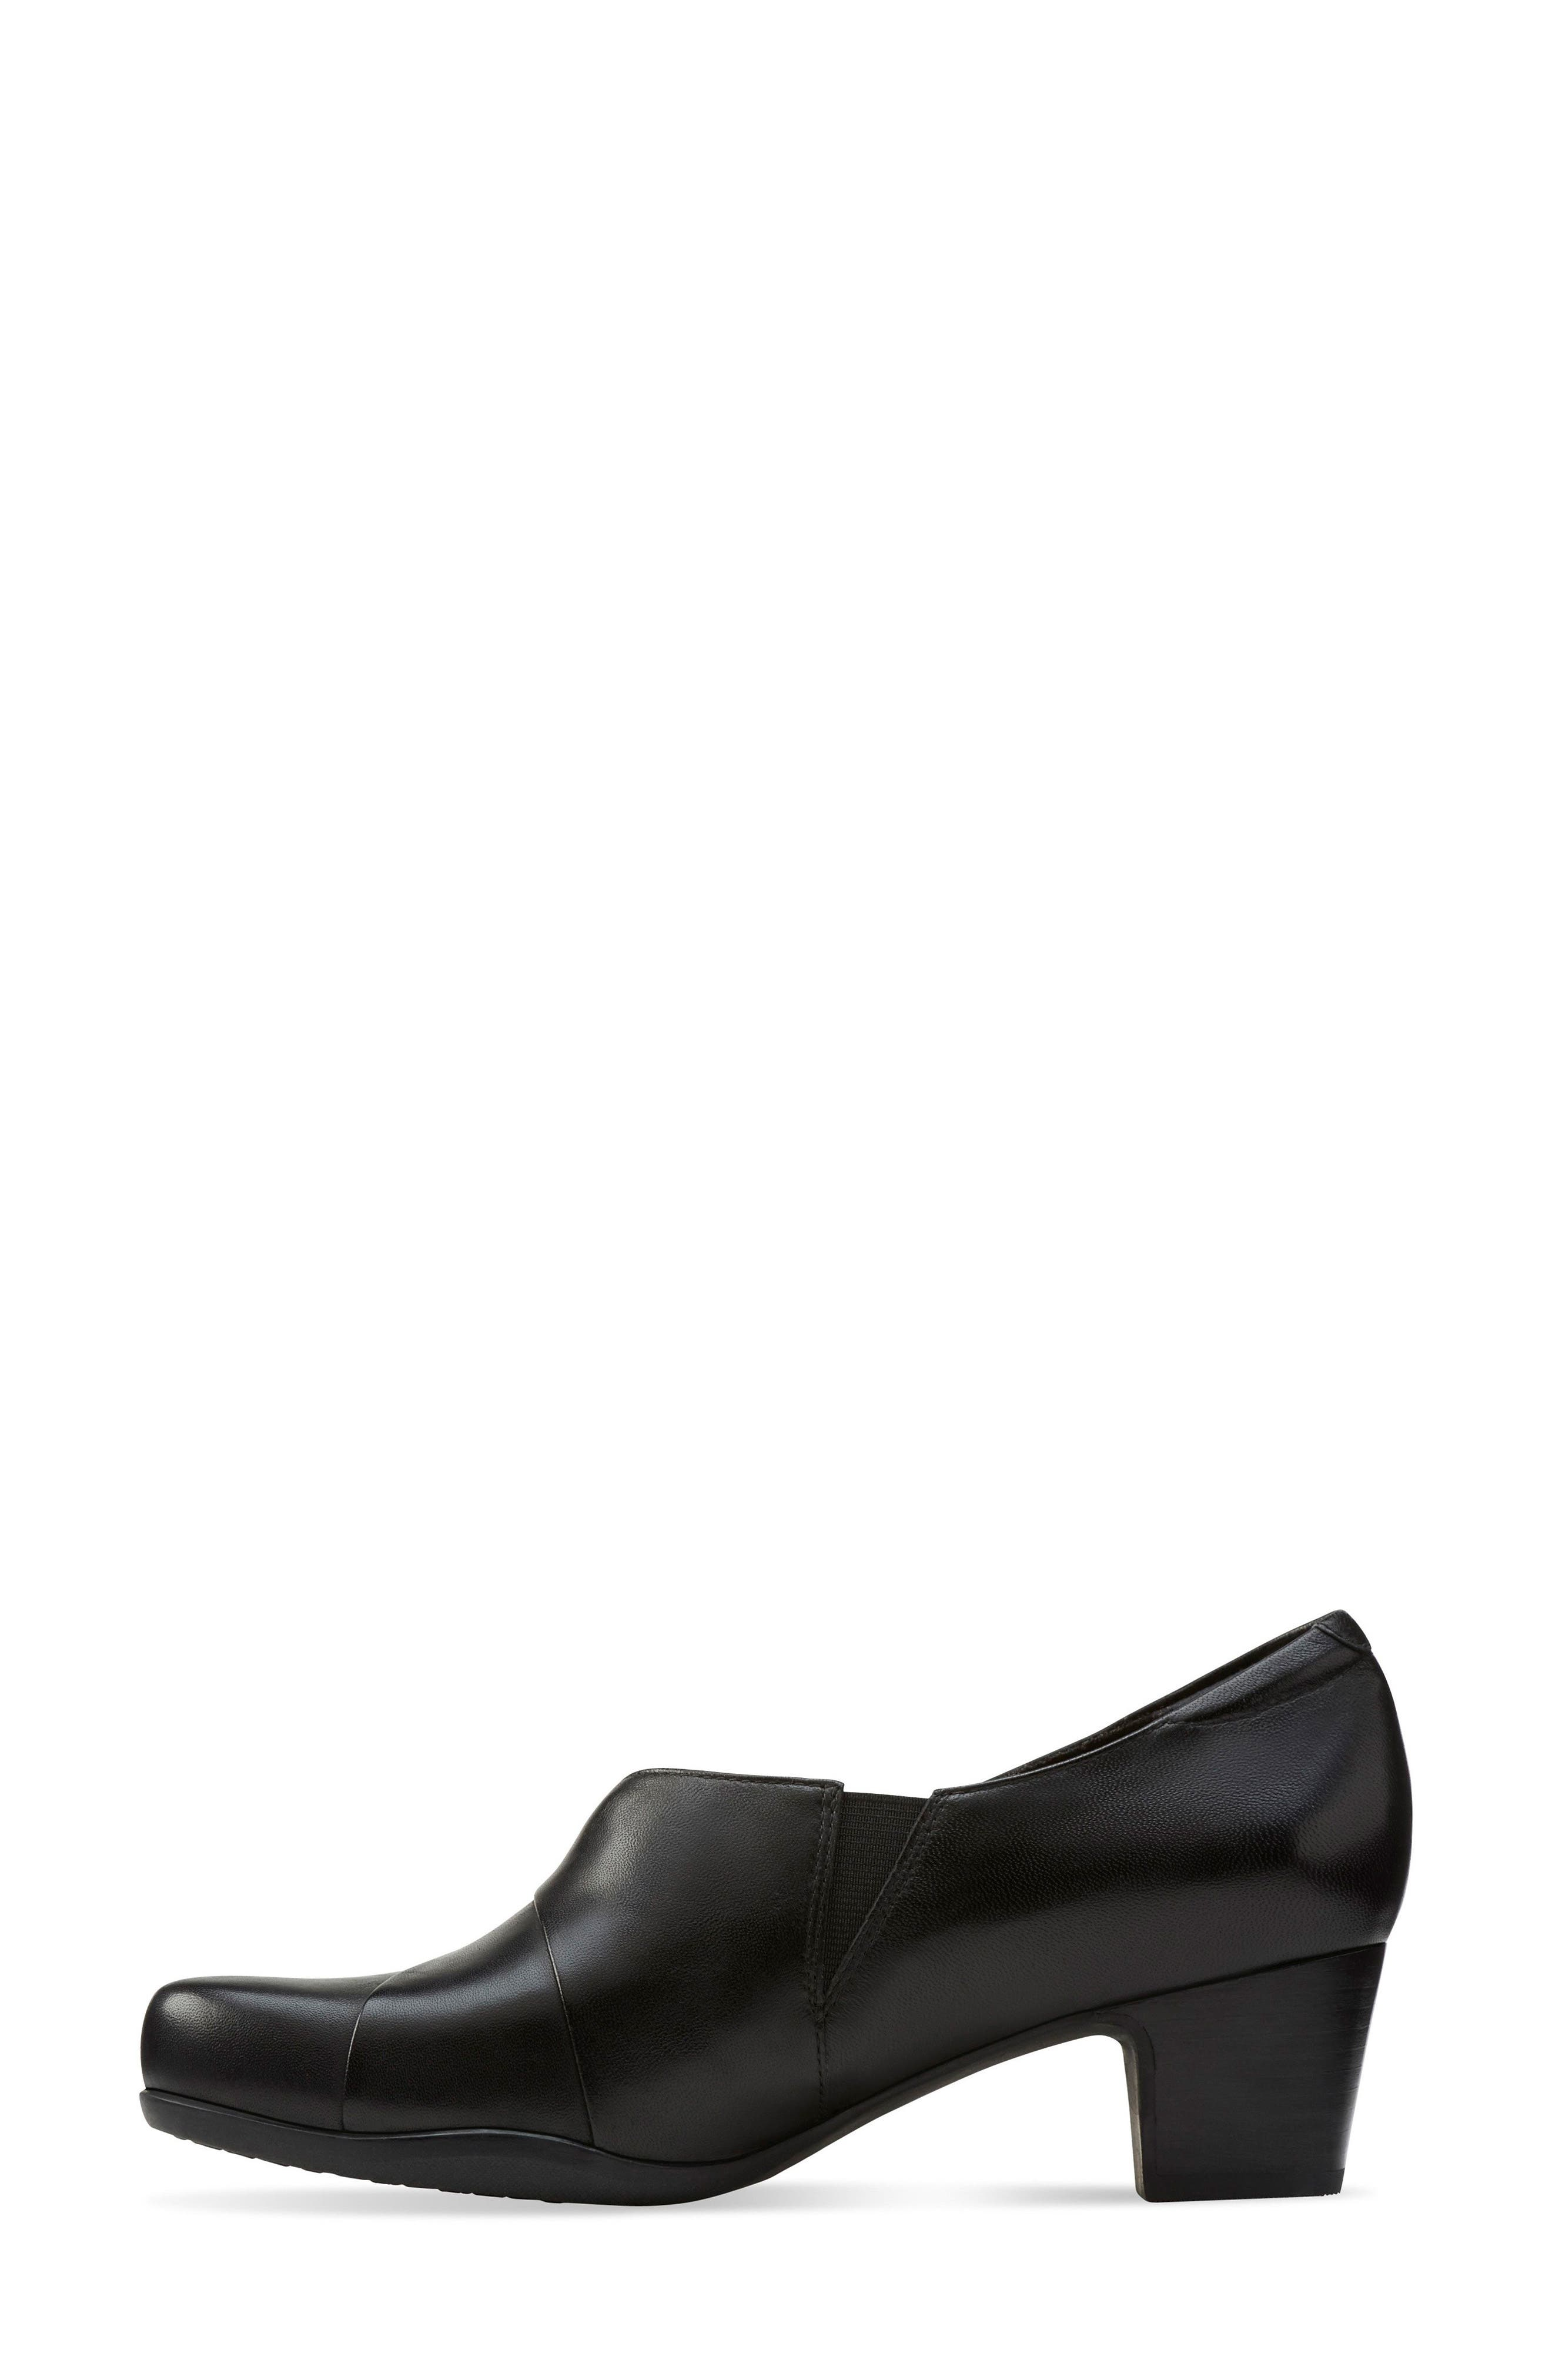 'Rosalyn Adele' Block Heel Pump,                             Alternate thumbnail 2, color,                             Black Leather